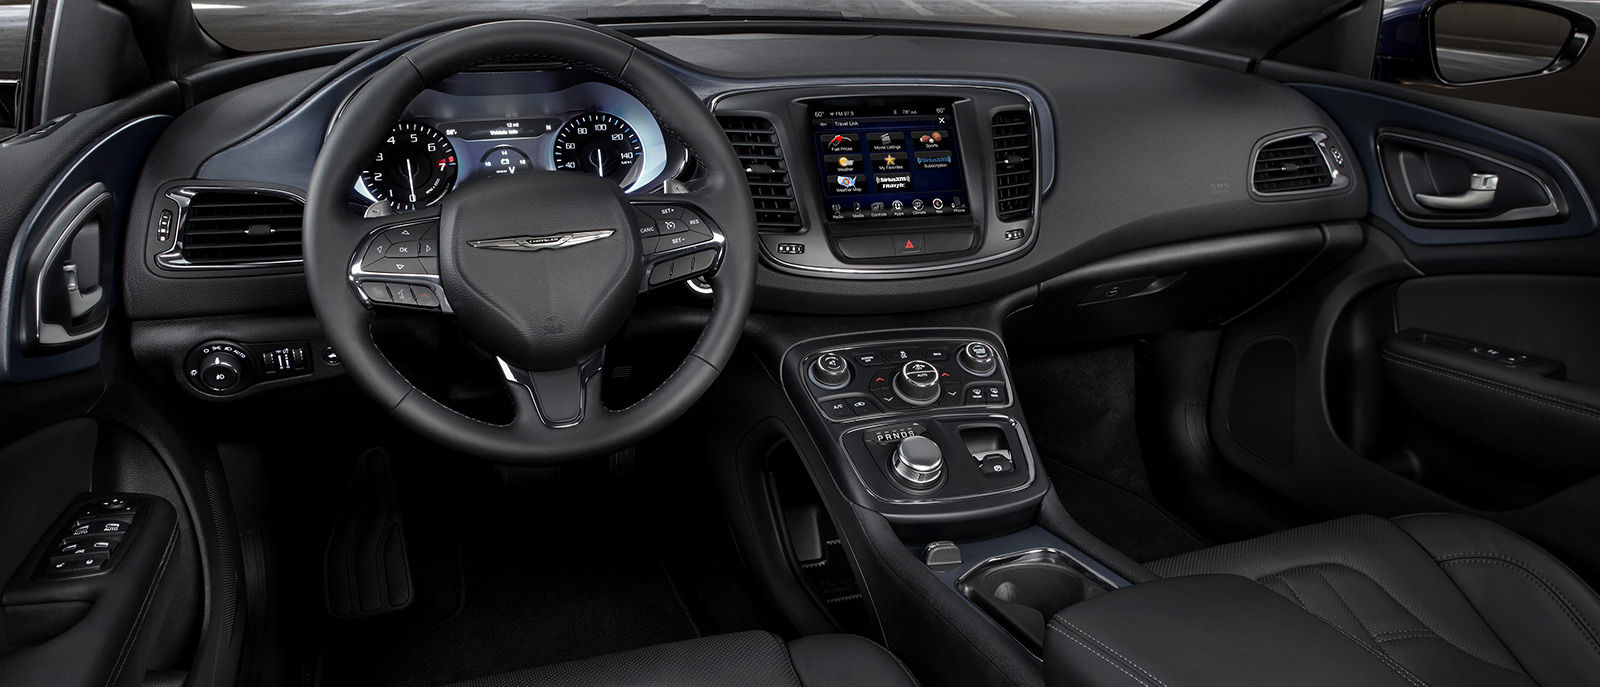 2016 chrysler 200 spartanburg chrysler spartanburg sc for 2016 chrysler 200 interior lights